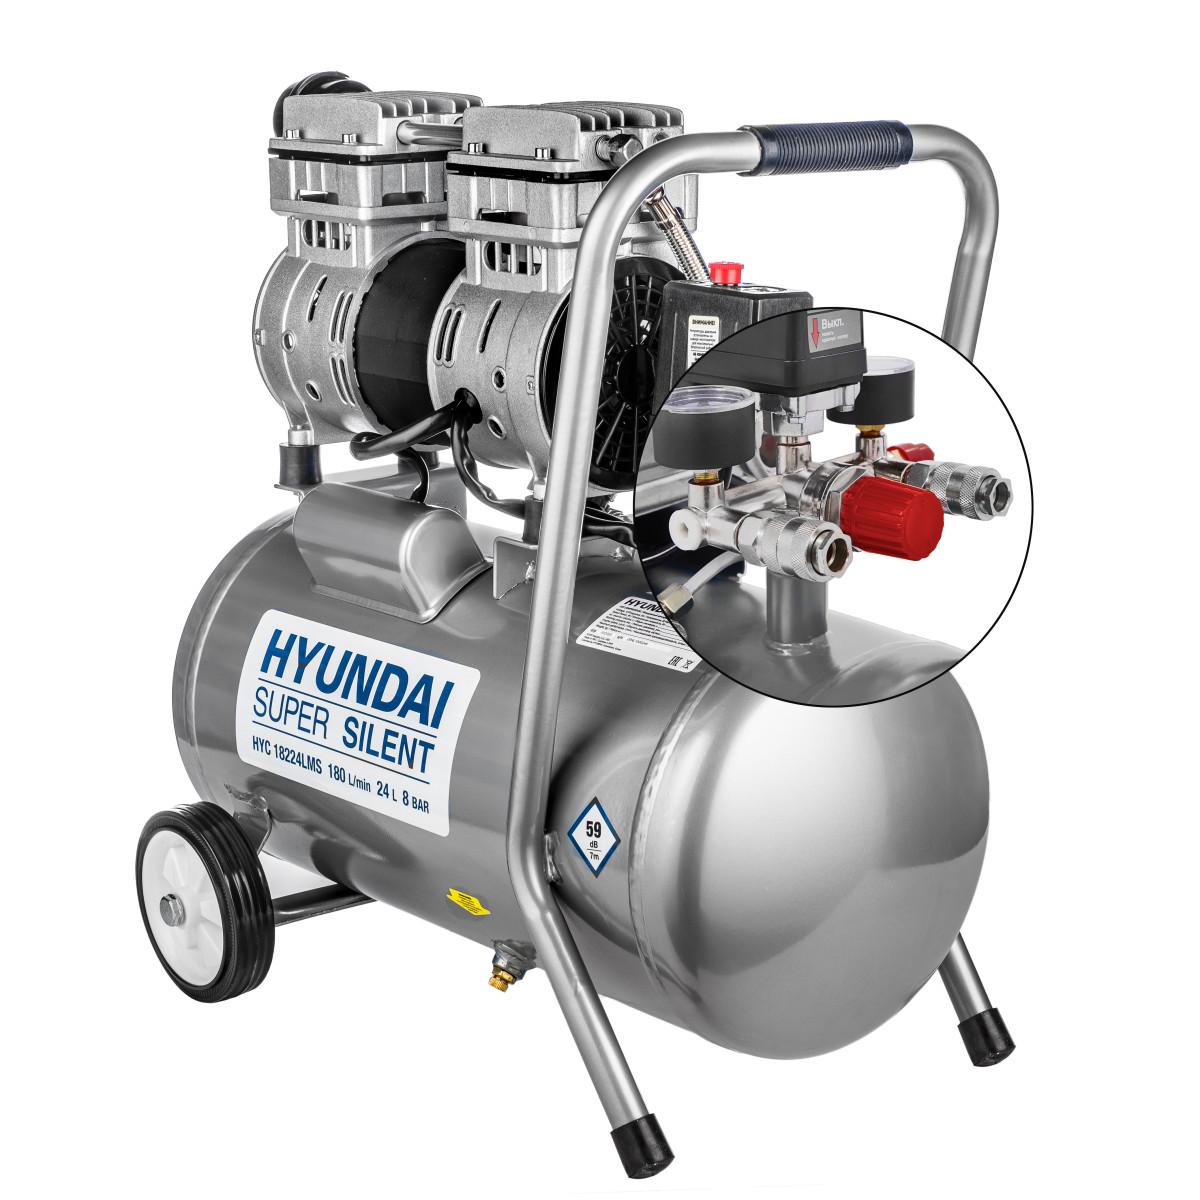 Компрессор Hyundai 24 л 180 л/мин 1 кВт